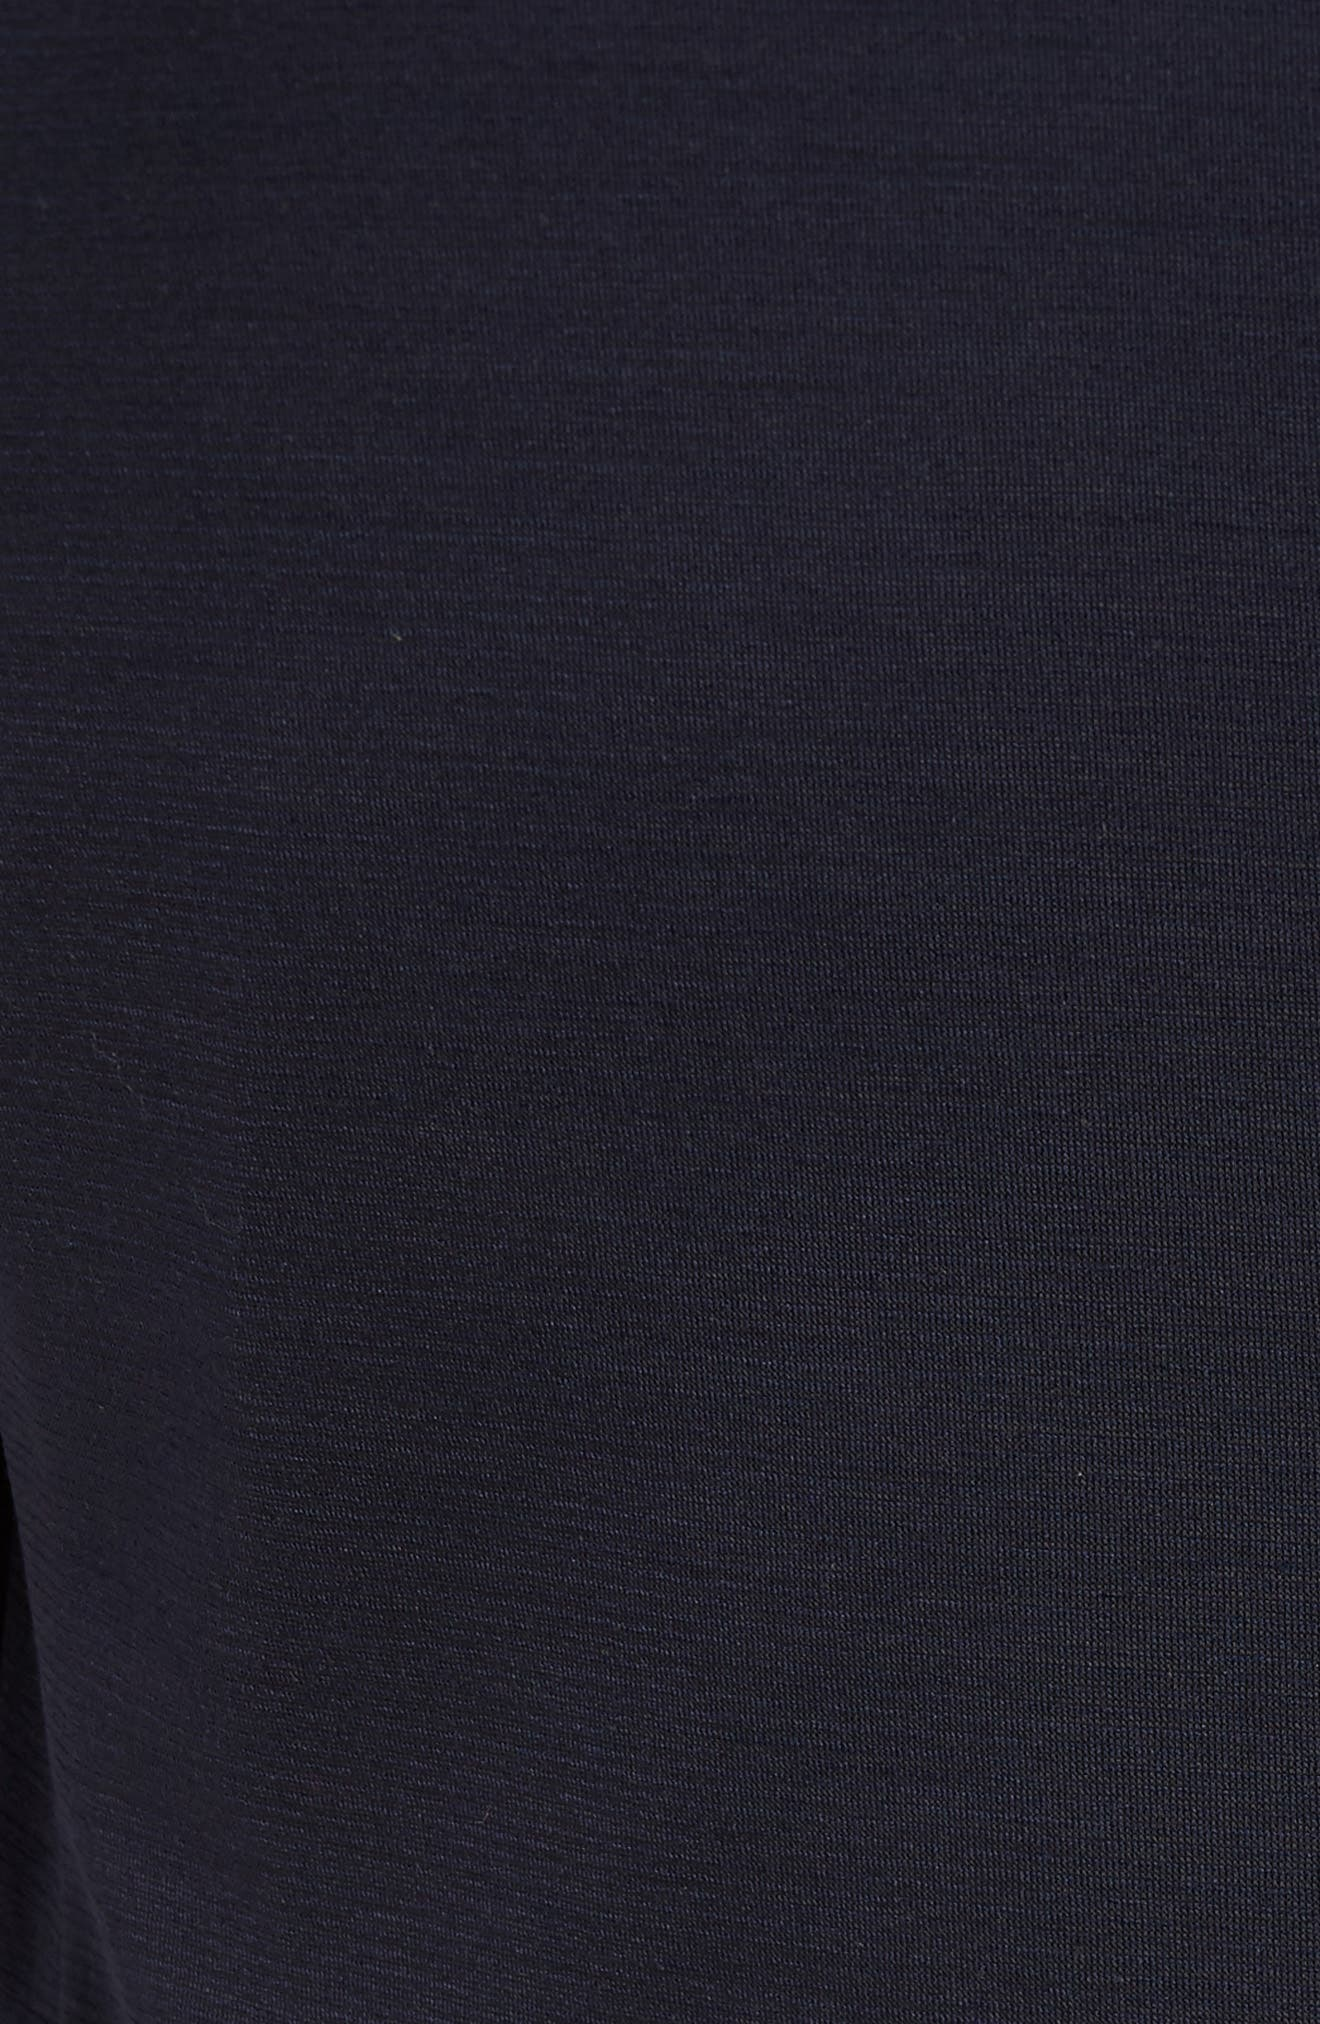 Norwin Trim Fit Wool Blend Sport Coat,                             Alternate thumbnail 6, color,                             410